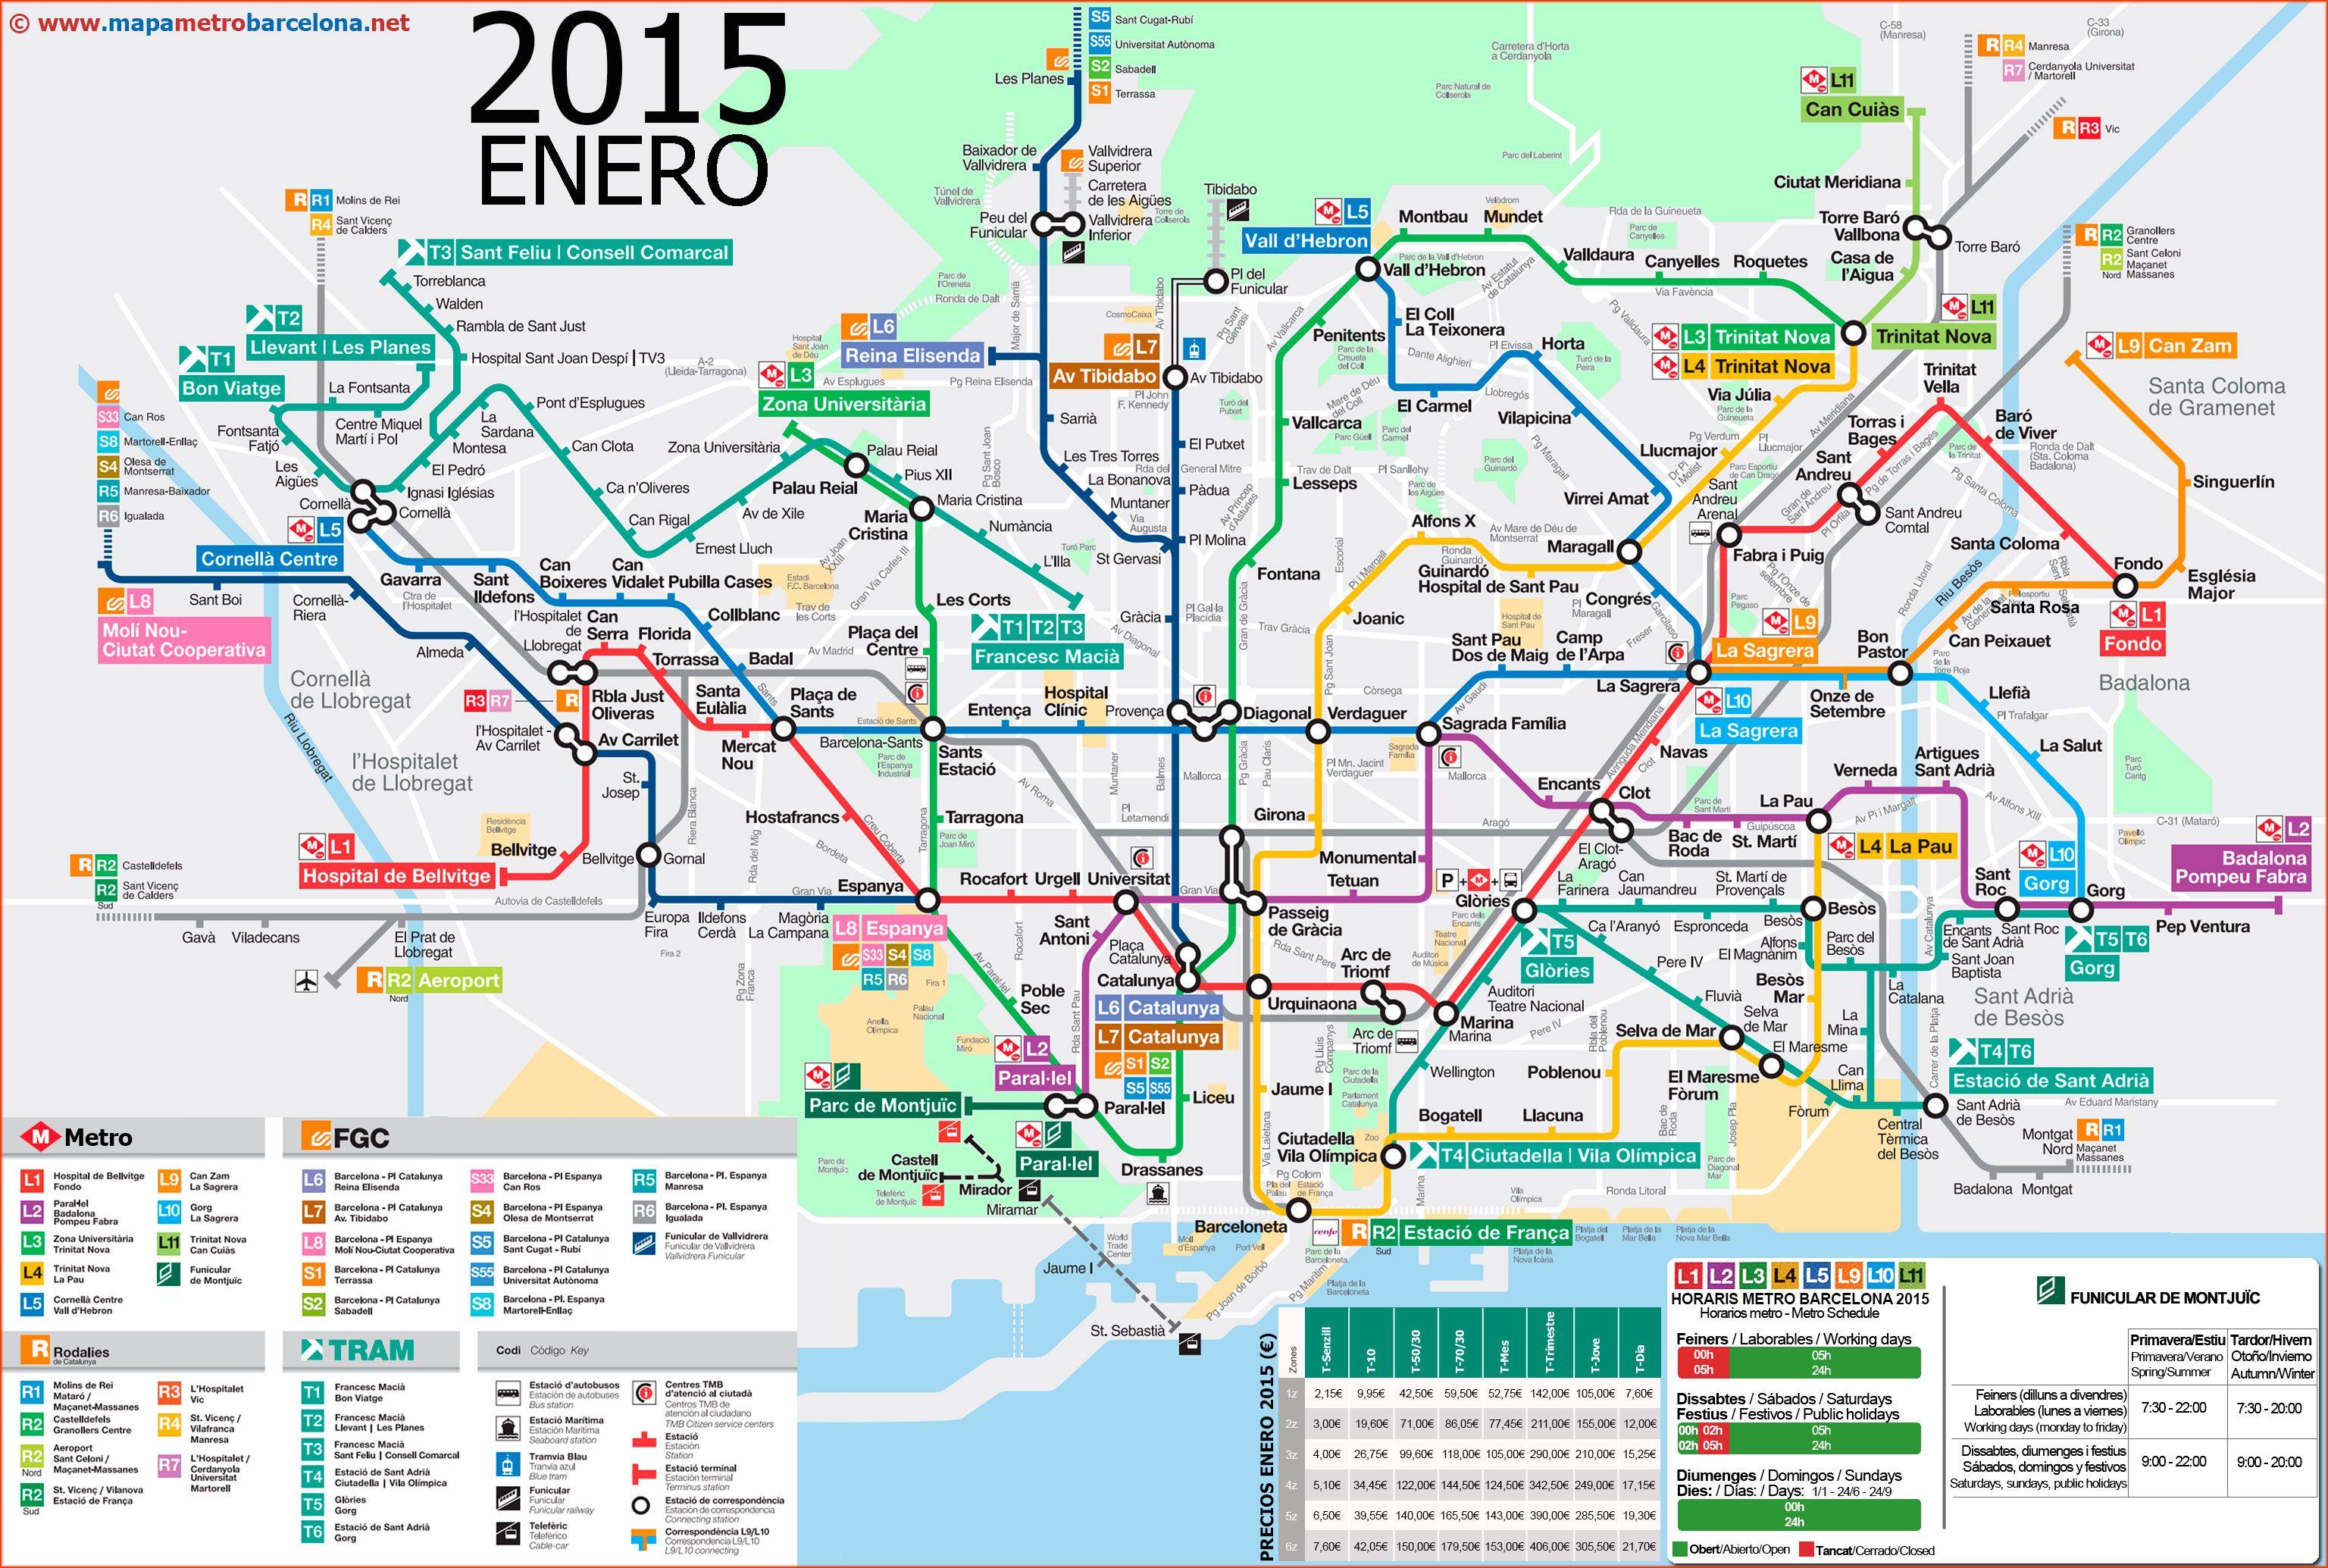 mapa-metro-barcelona-2015-01. ...